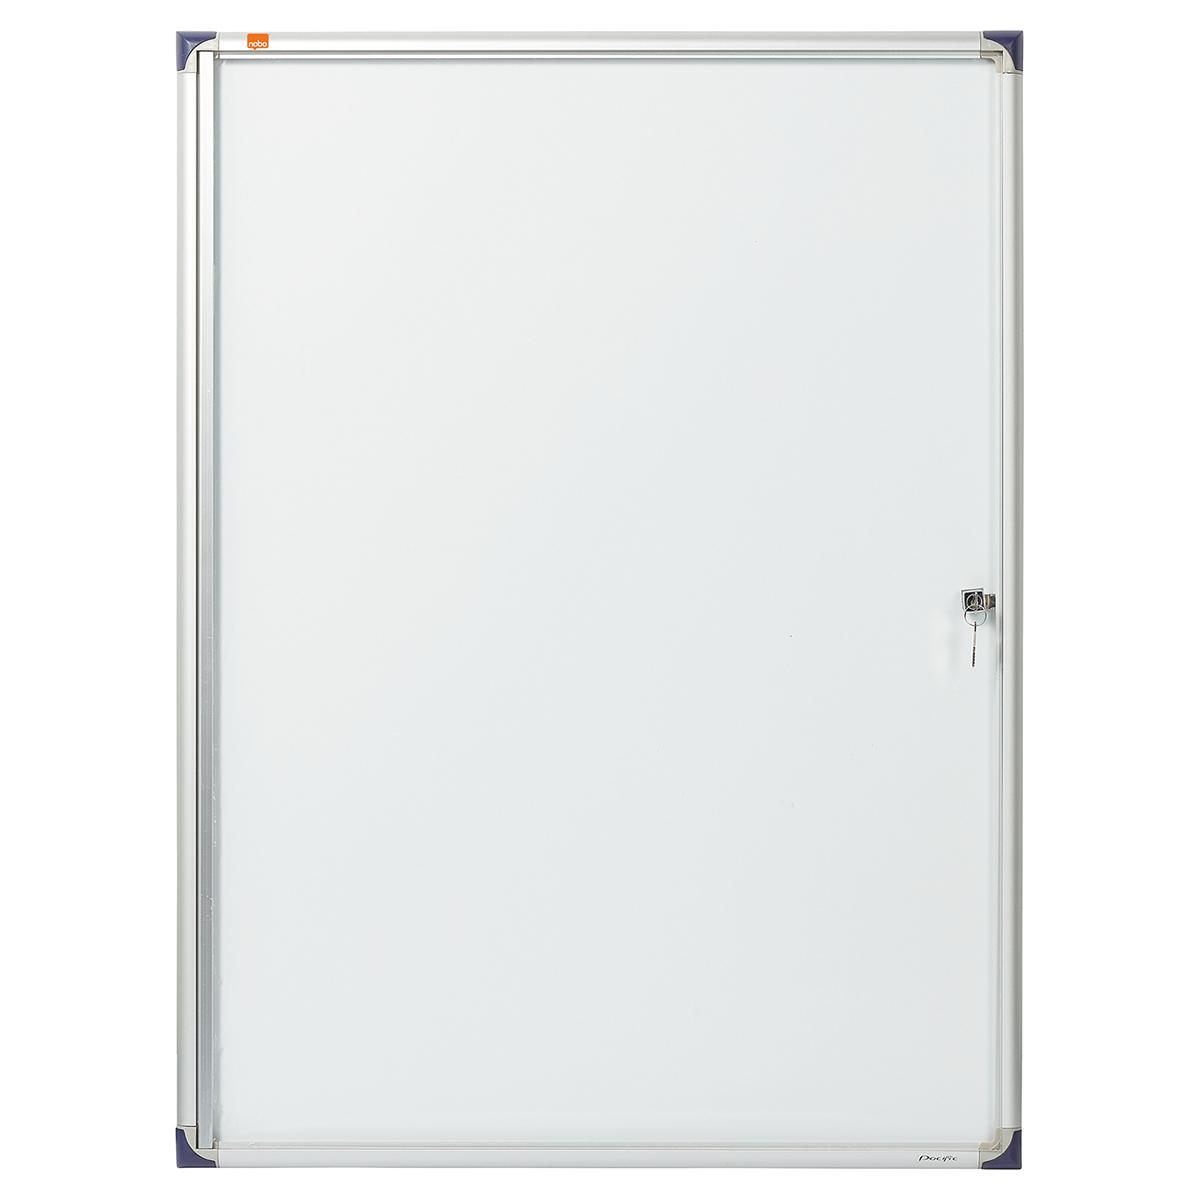 Nobo 1902282 Internal Flat Glazed Case 9 x A4 Magnetic